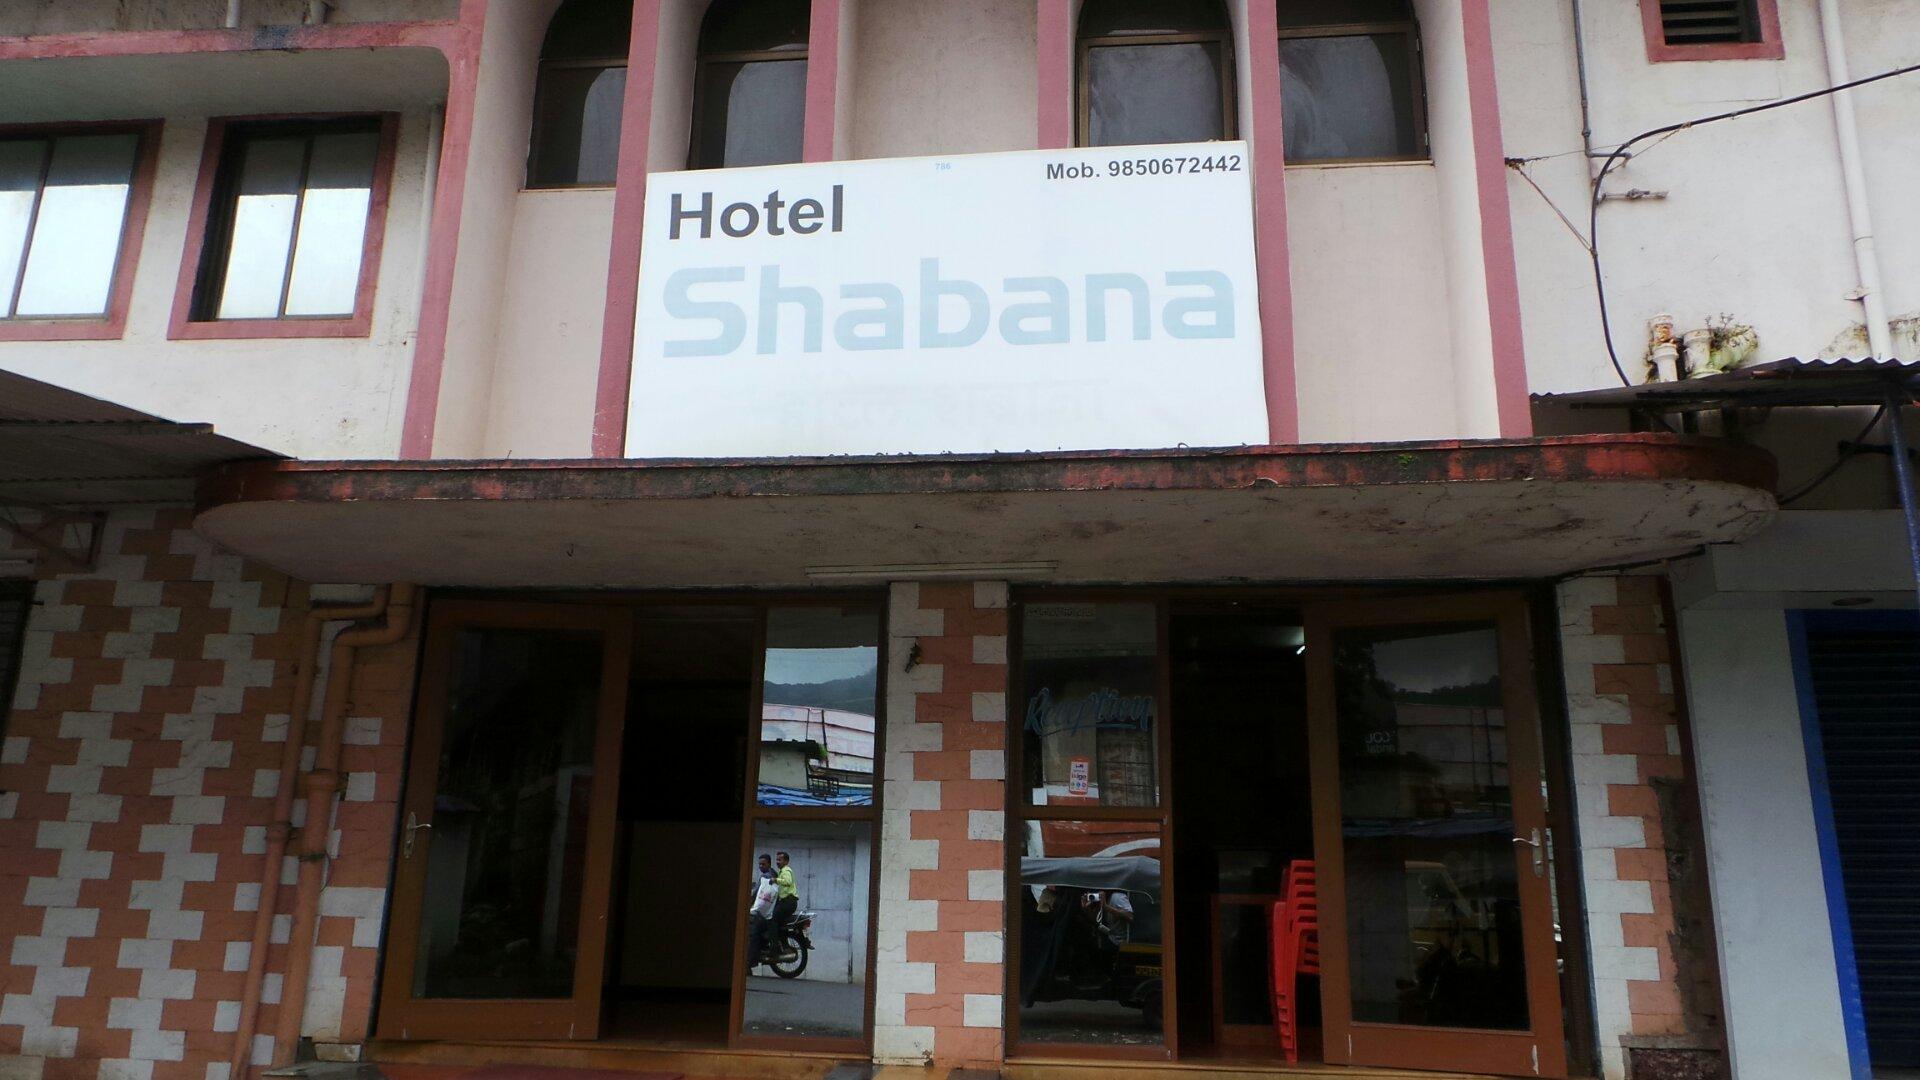 Hotel Clarissa in Khandala